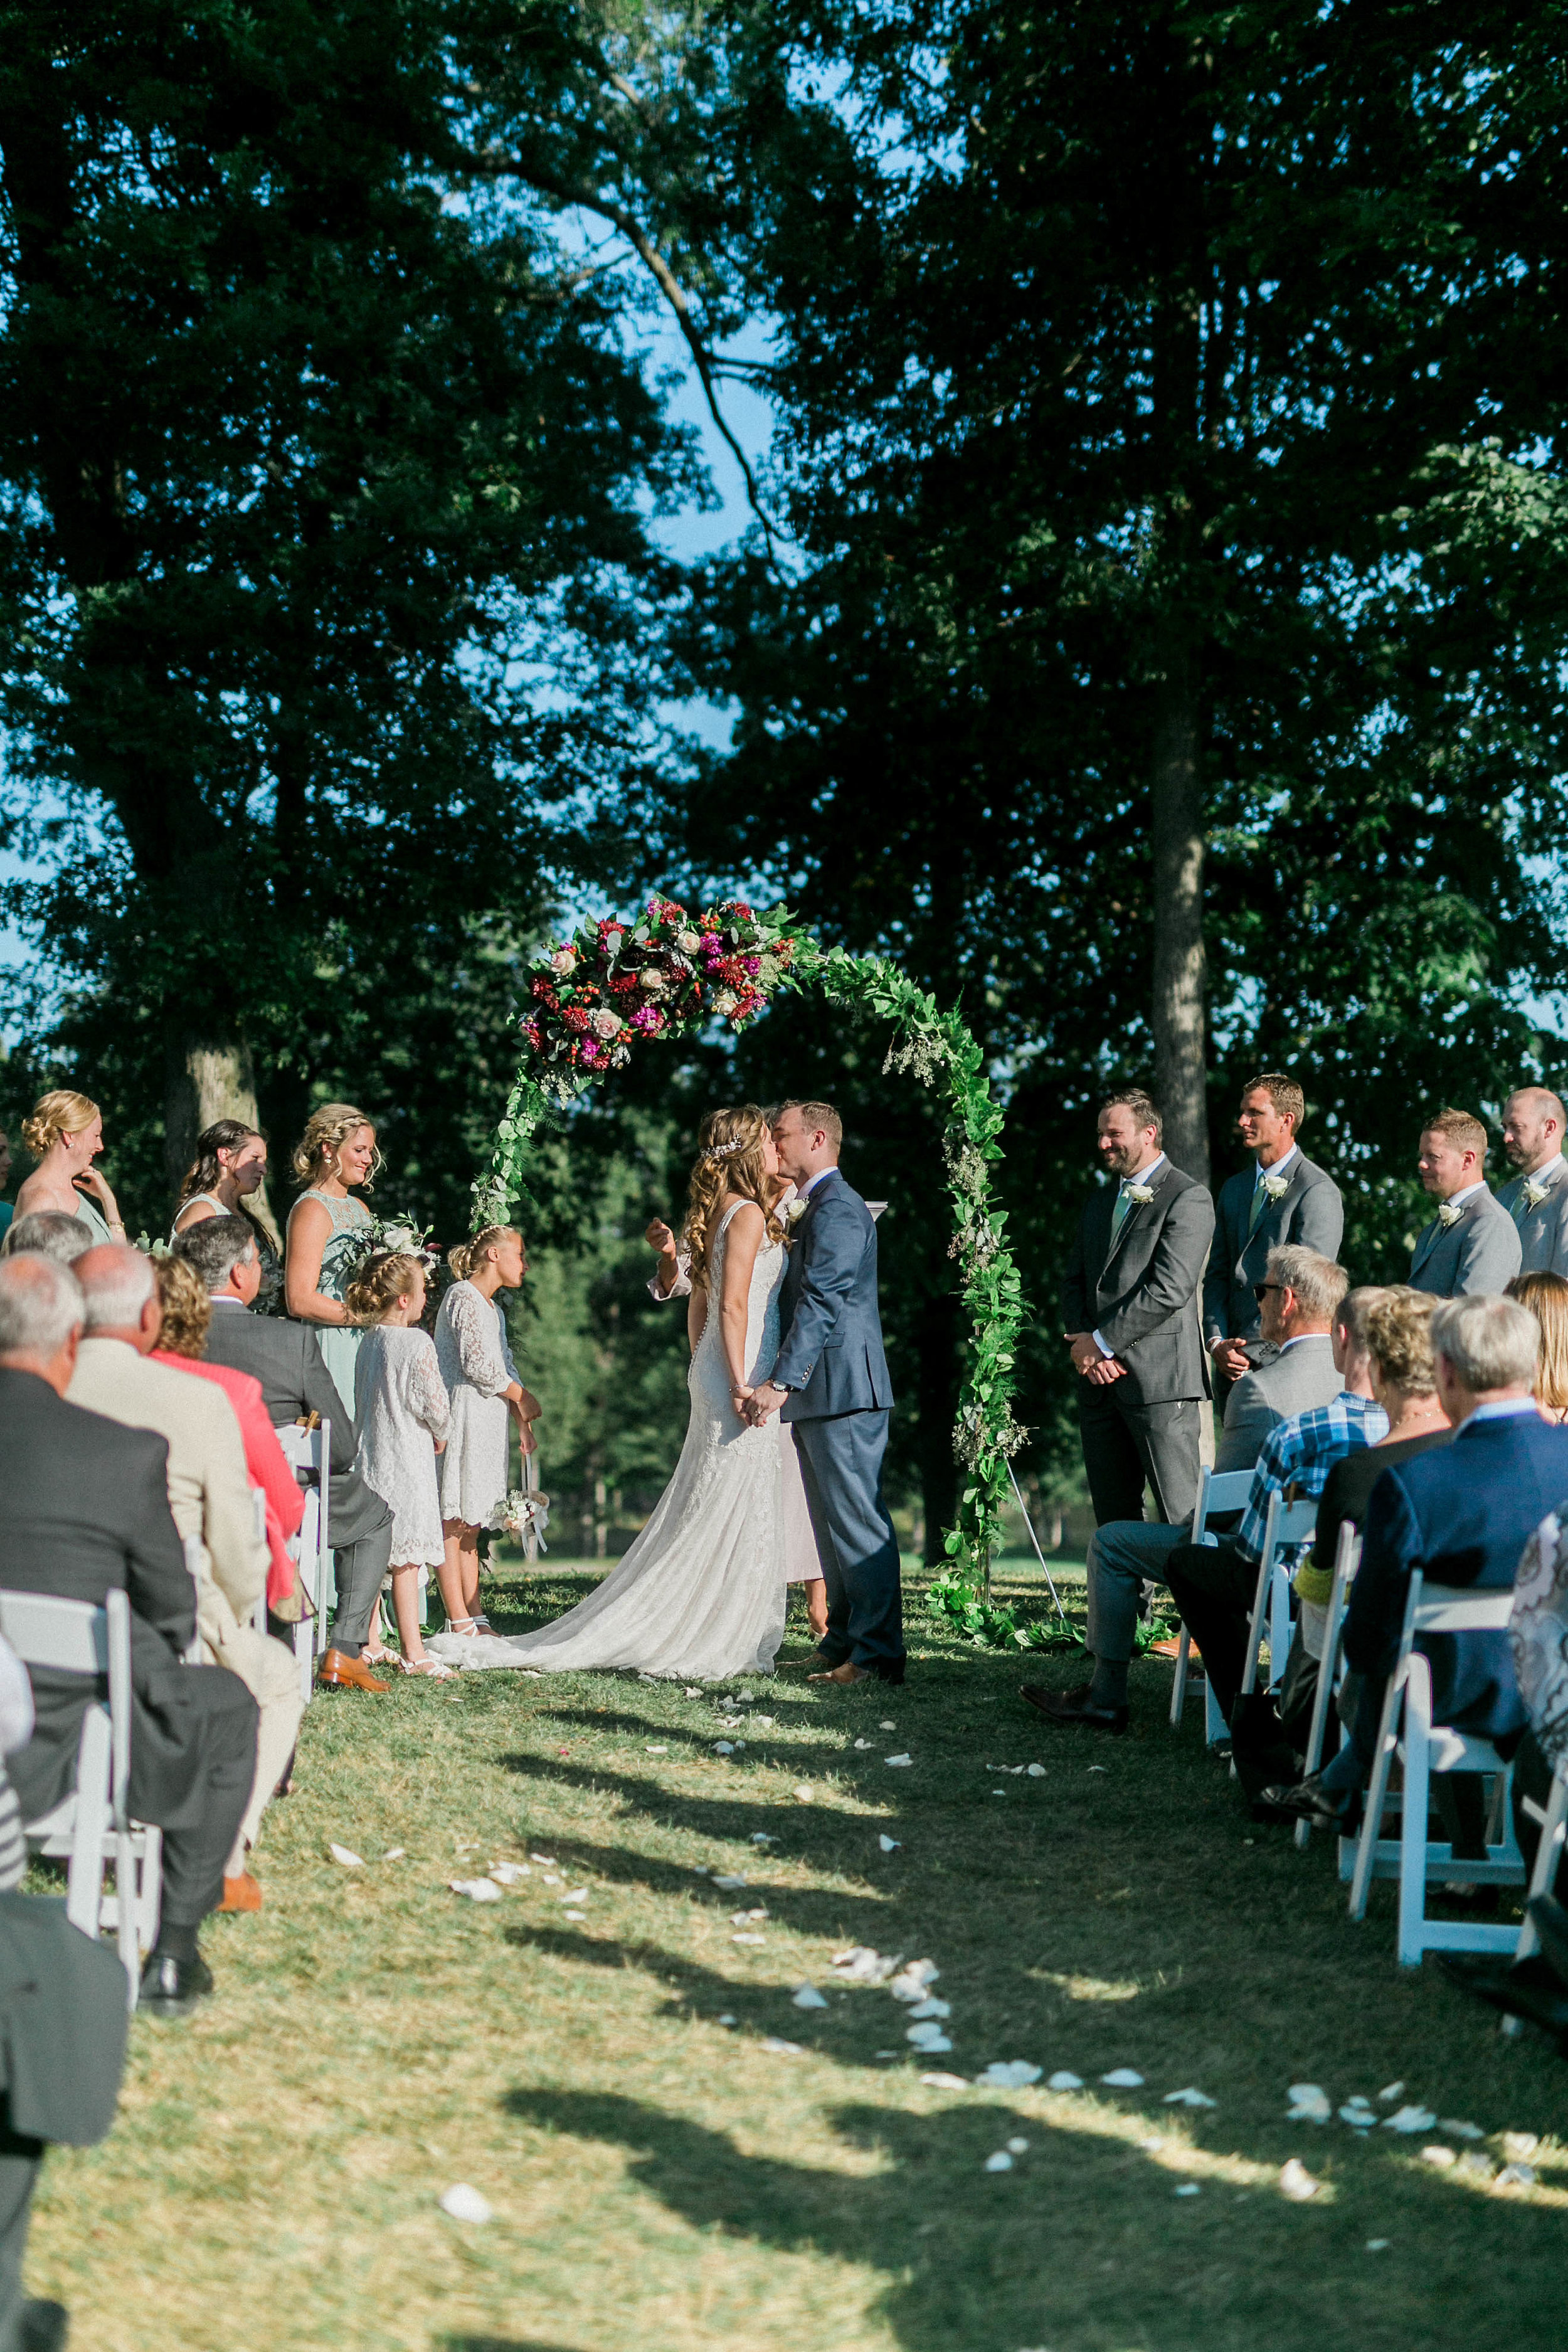 WeddingPlanningMiriamBulcher9JPG.jpg